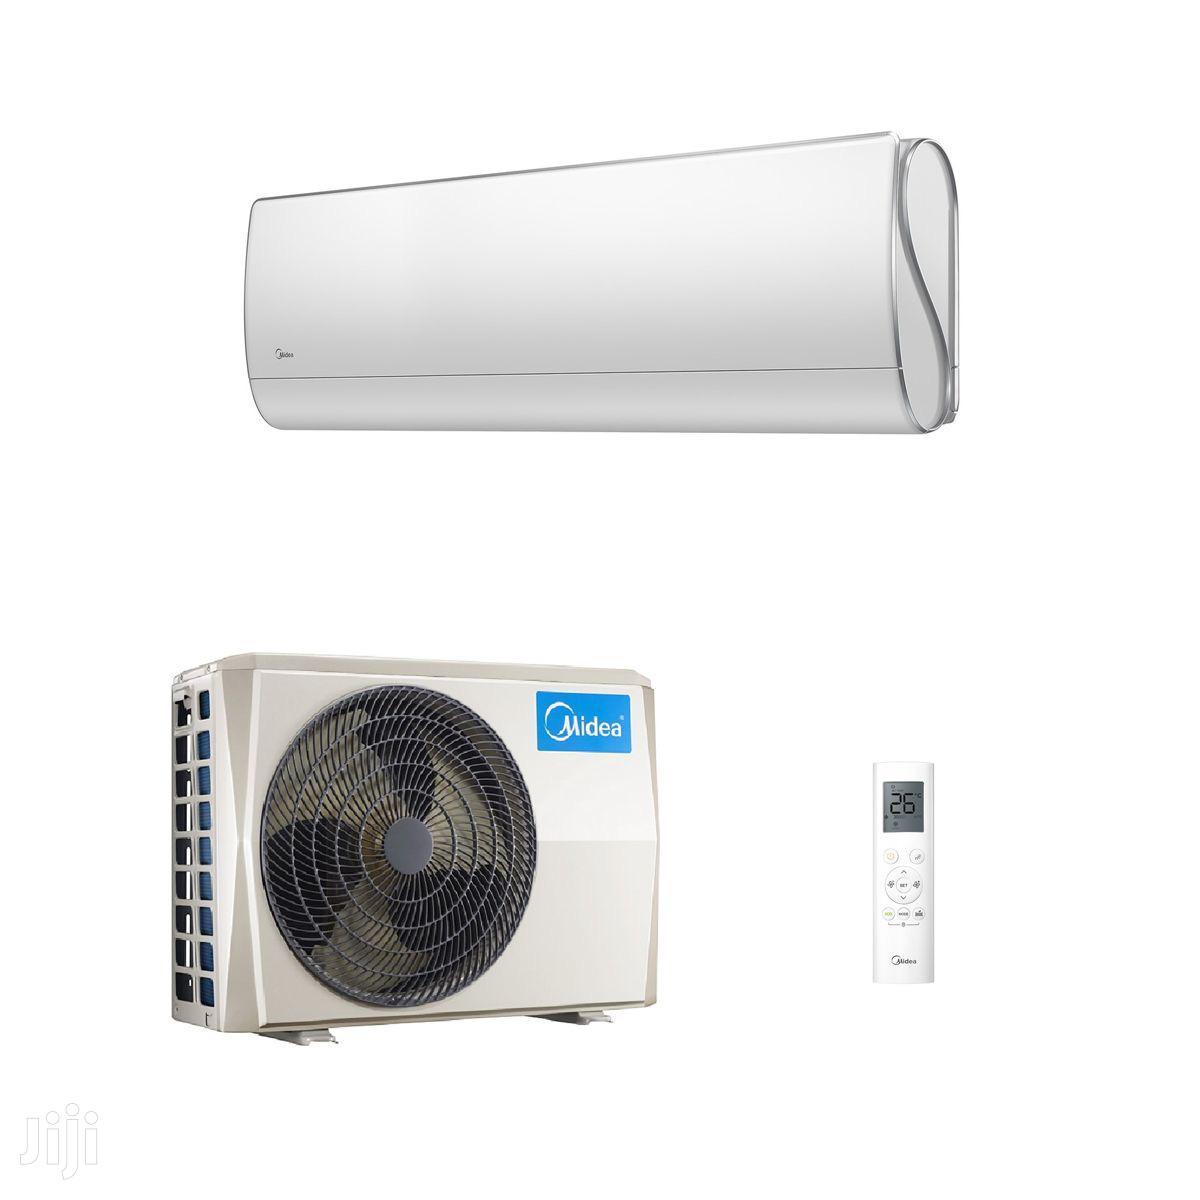 Midea 1.5hp R22 Gas Split Air Conditioner